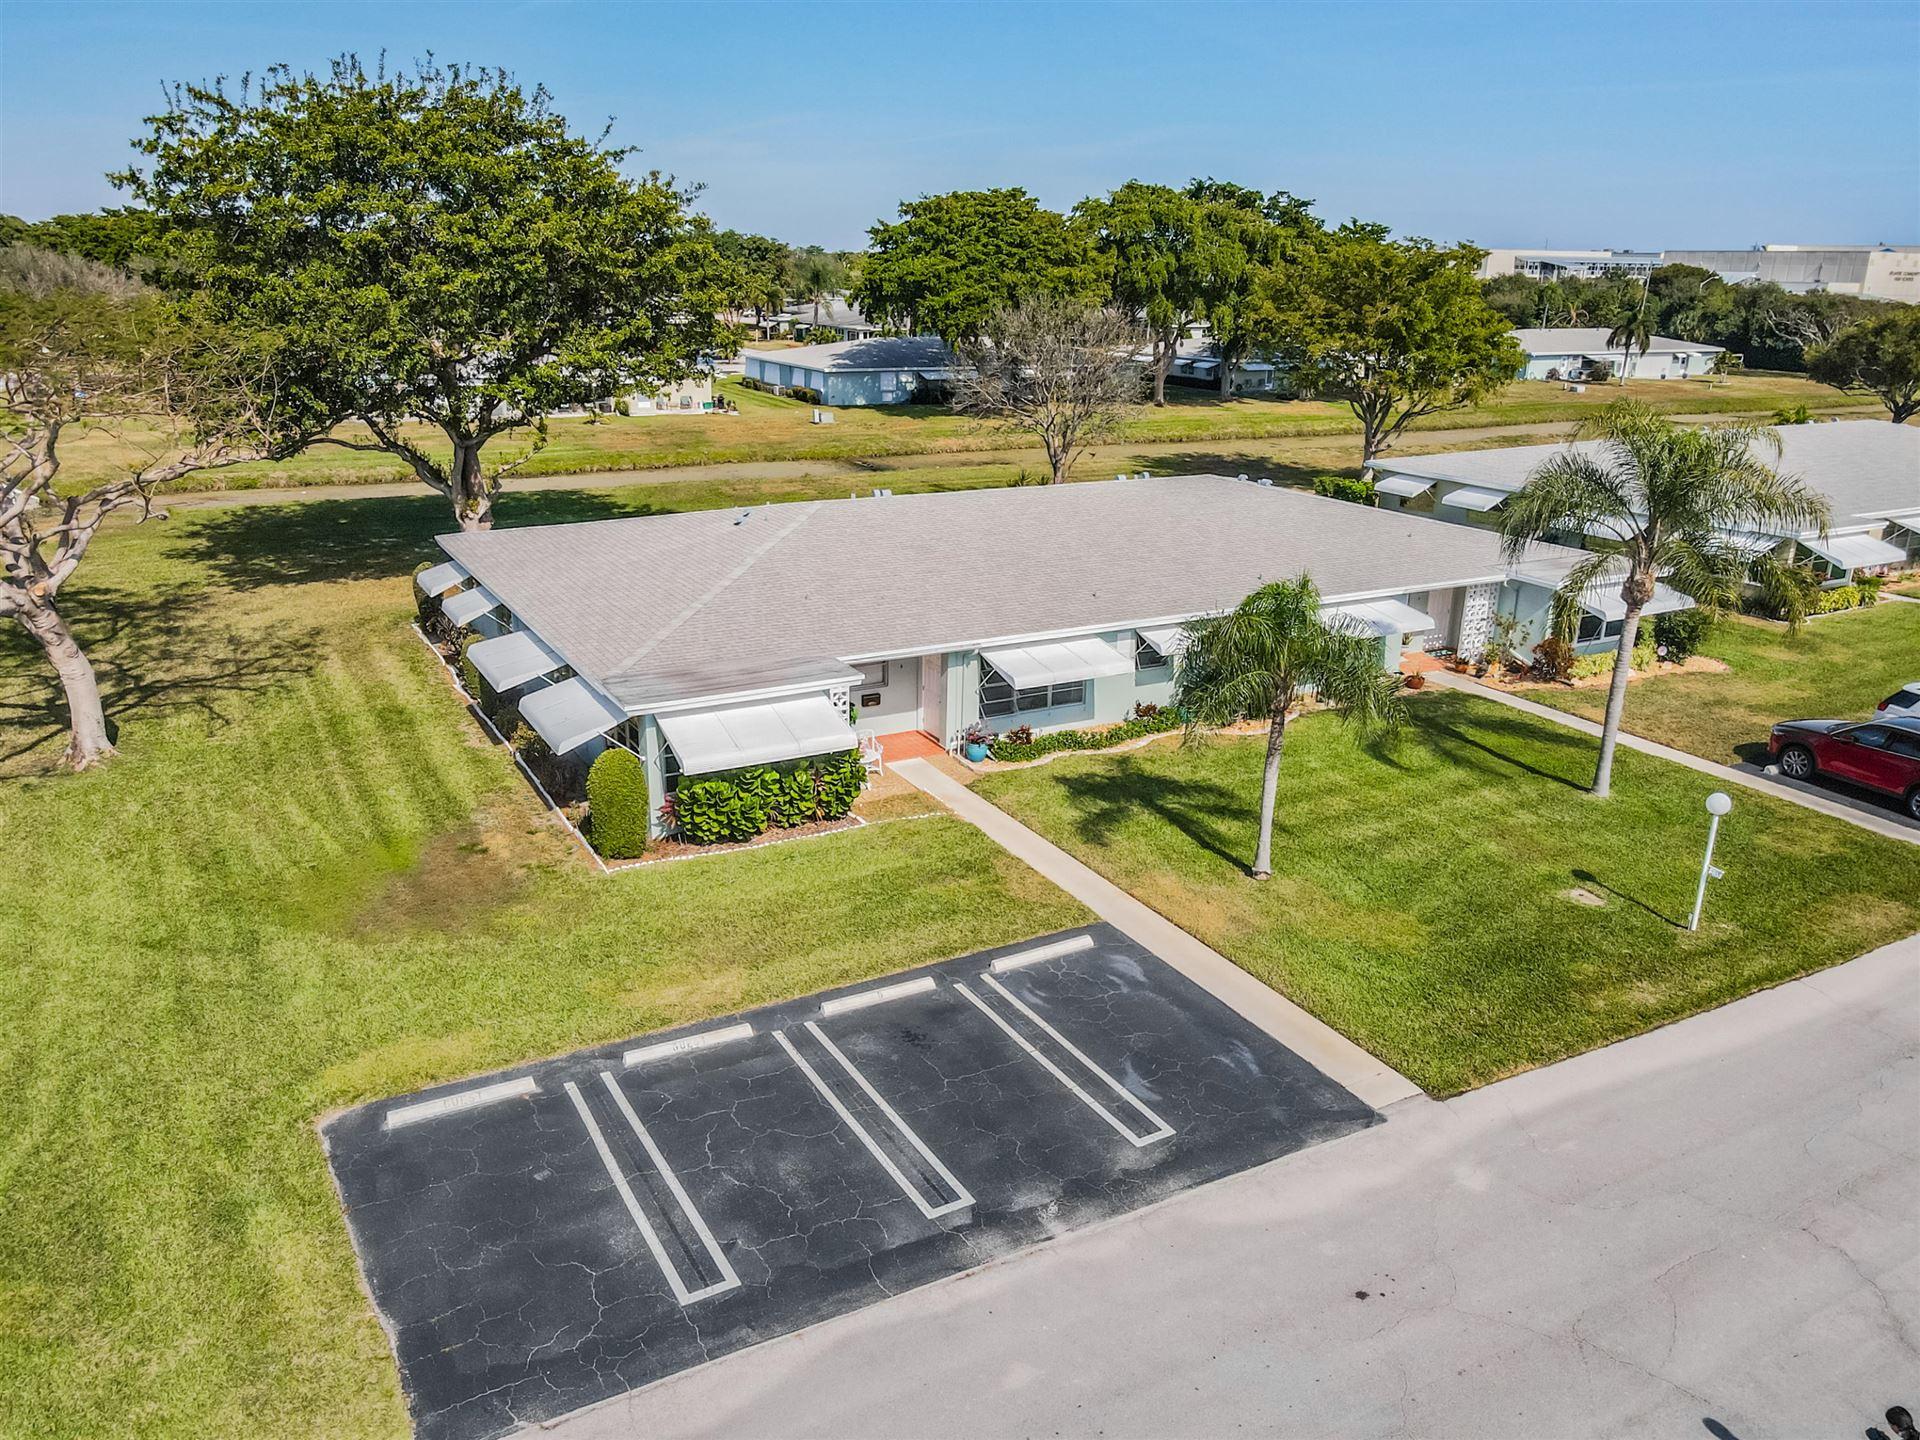 Photo of 235 High Point Court E #B, Delray Beach, FL 33445 (MLS # RX-10686940)